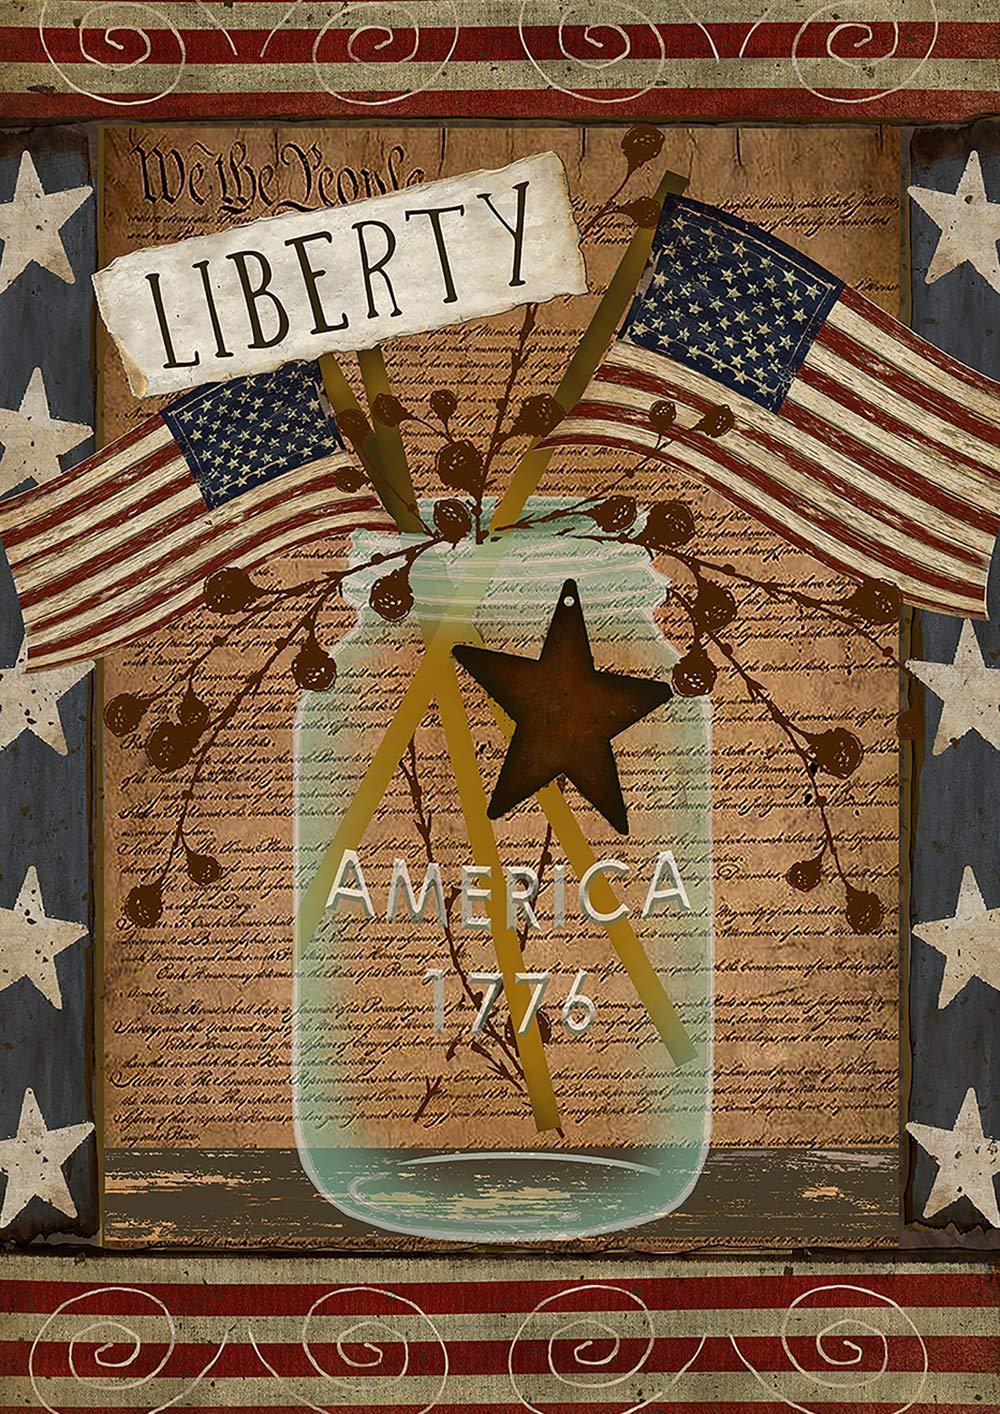 Toland Home Garden 1112202 American Liberty 12.5 x 18 Inch Decorative, Patriotic Mason Jar Garden Flag